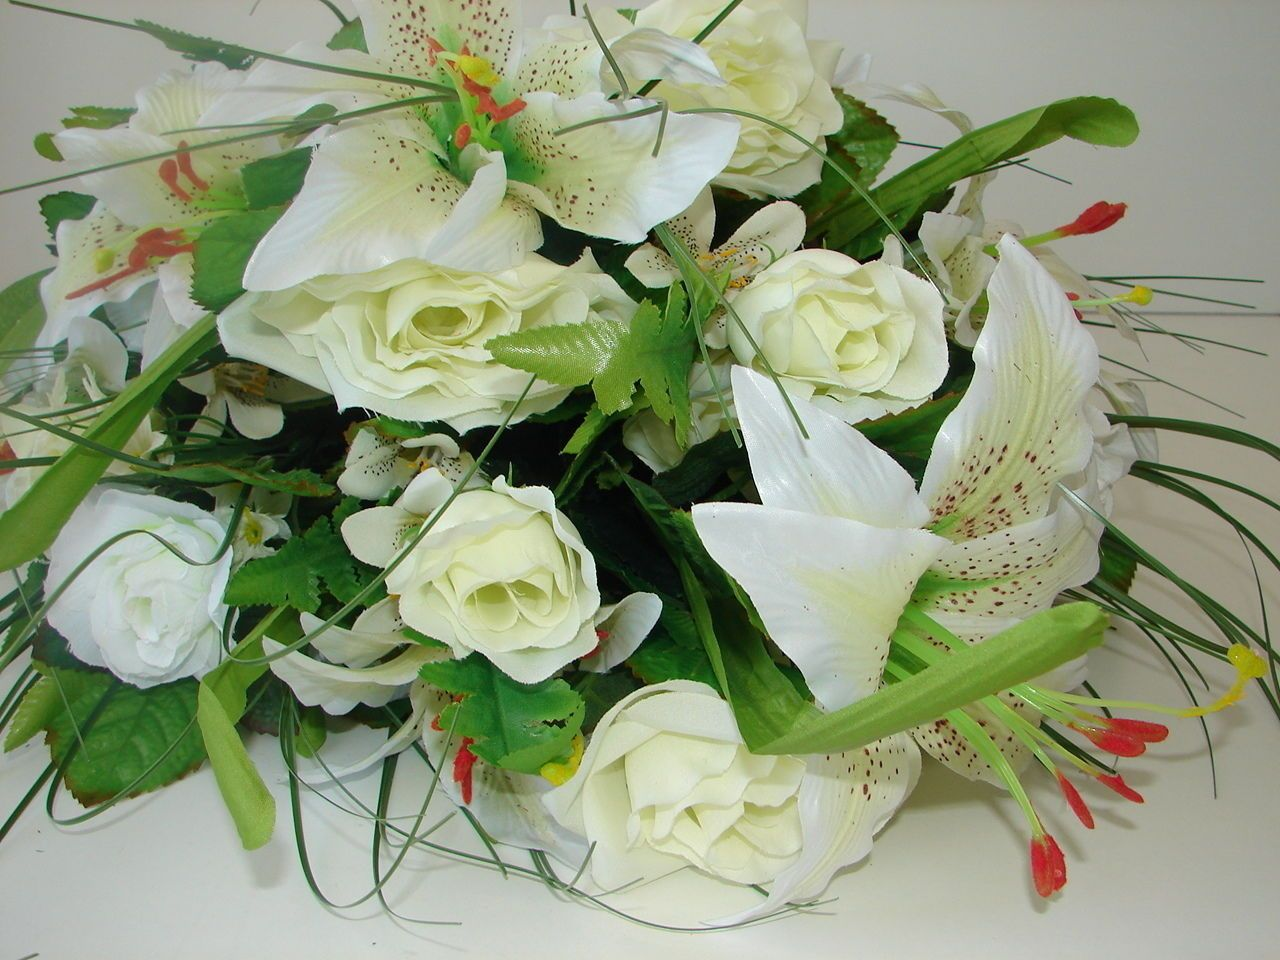 Blumenstrau Xxl Lilien Rosen Gr N Wei 70cm Neu In Ovp